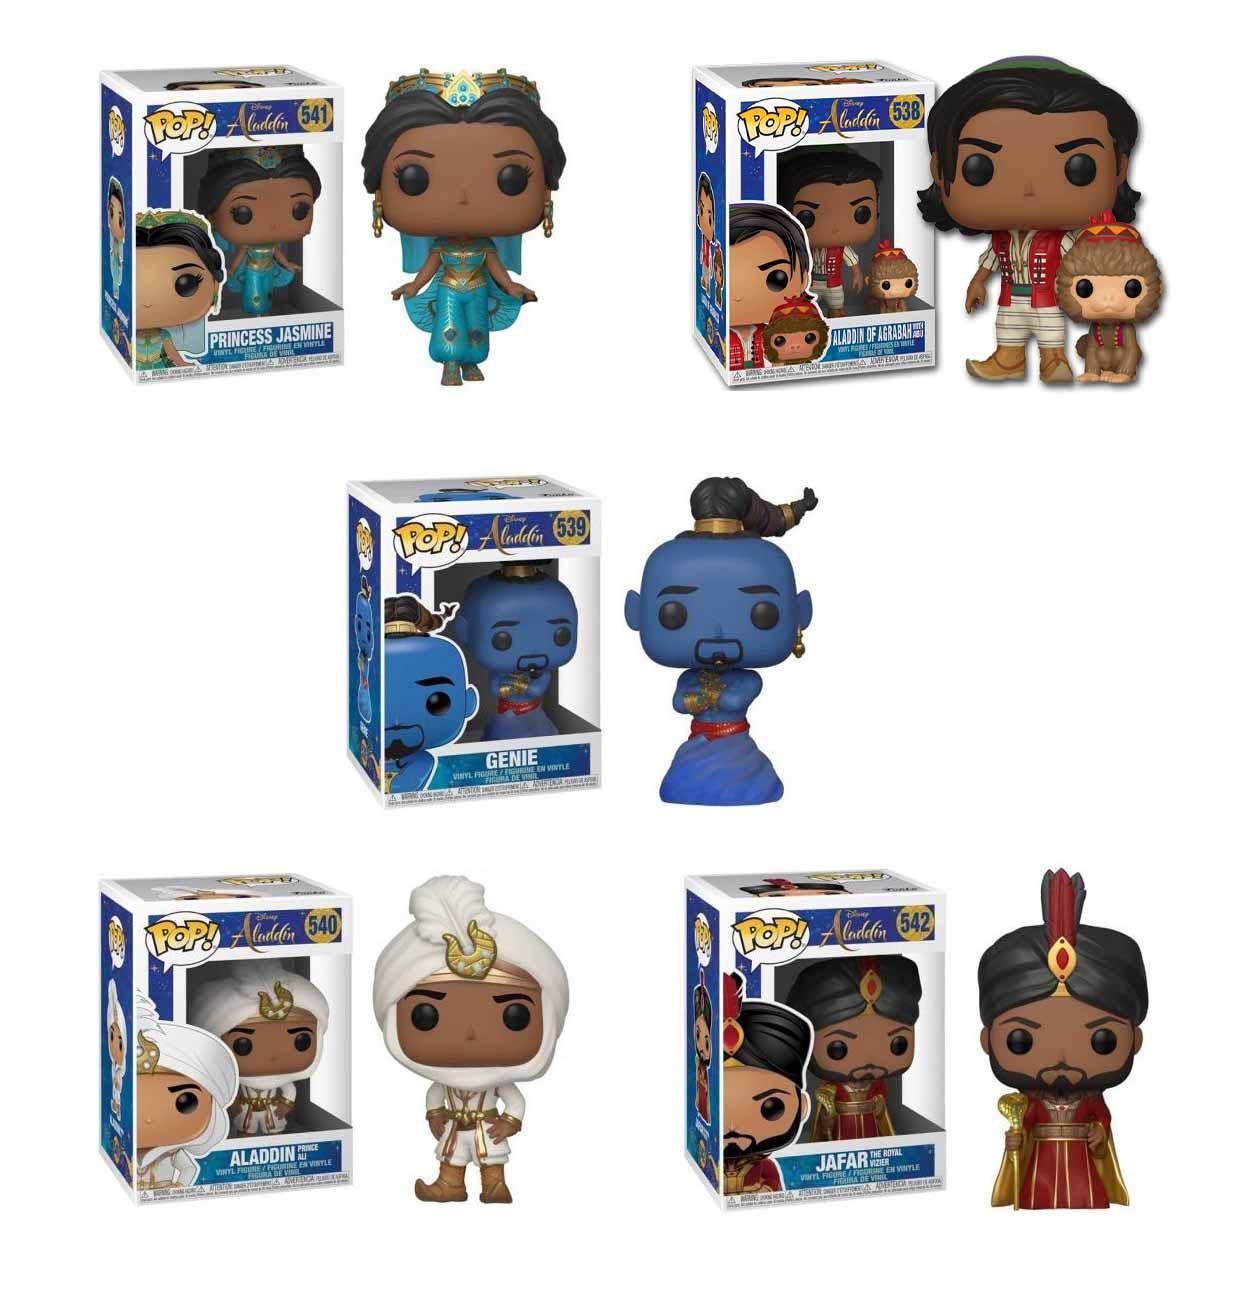 PRÉ VENDA: Pack Funko Pop! Aladdin 2019 (Agrabah With Abu) - Set de 5 - Funko